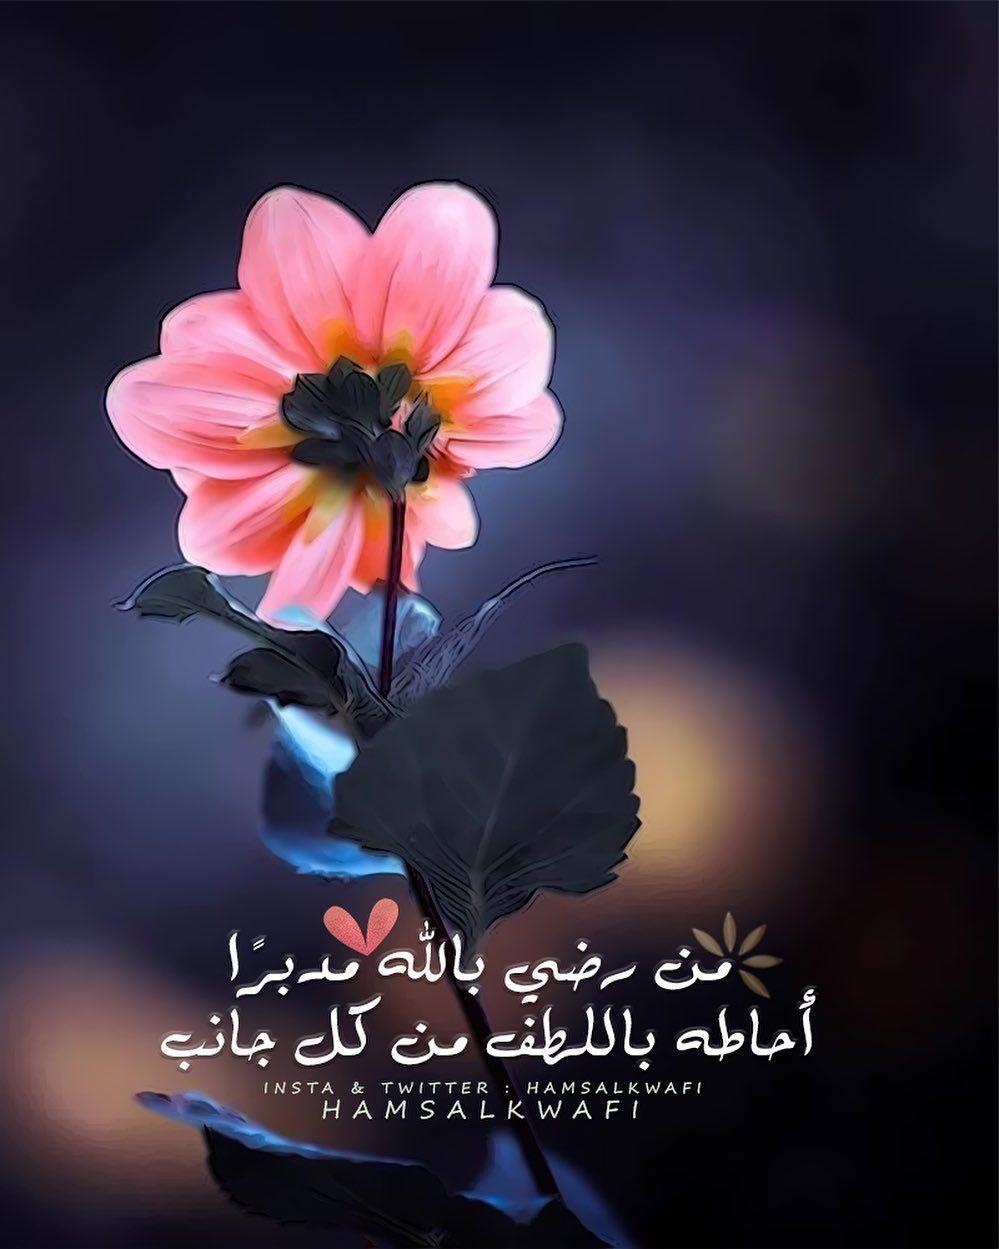 826 Likes 14 Comments كہ ن ذا أثہ ـر Hamsalkwafi On Instagram إذهب إلى الله بضعفك يأتيك Islamic Posters Islamic Pictures Motivational Art Quotes